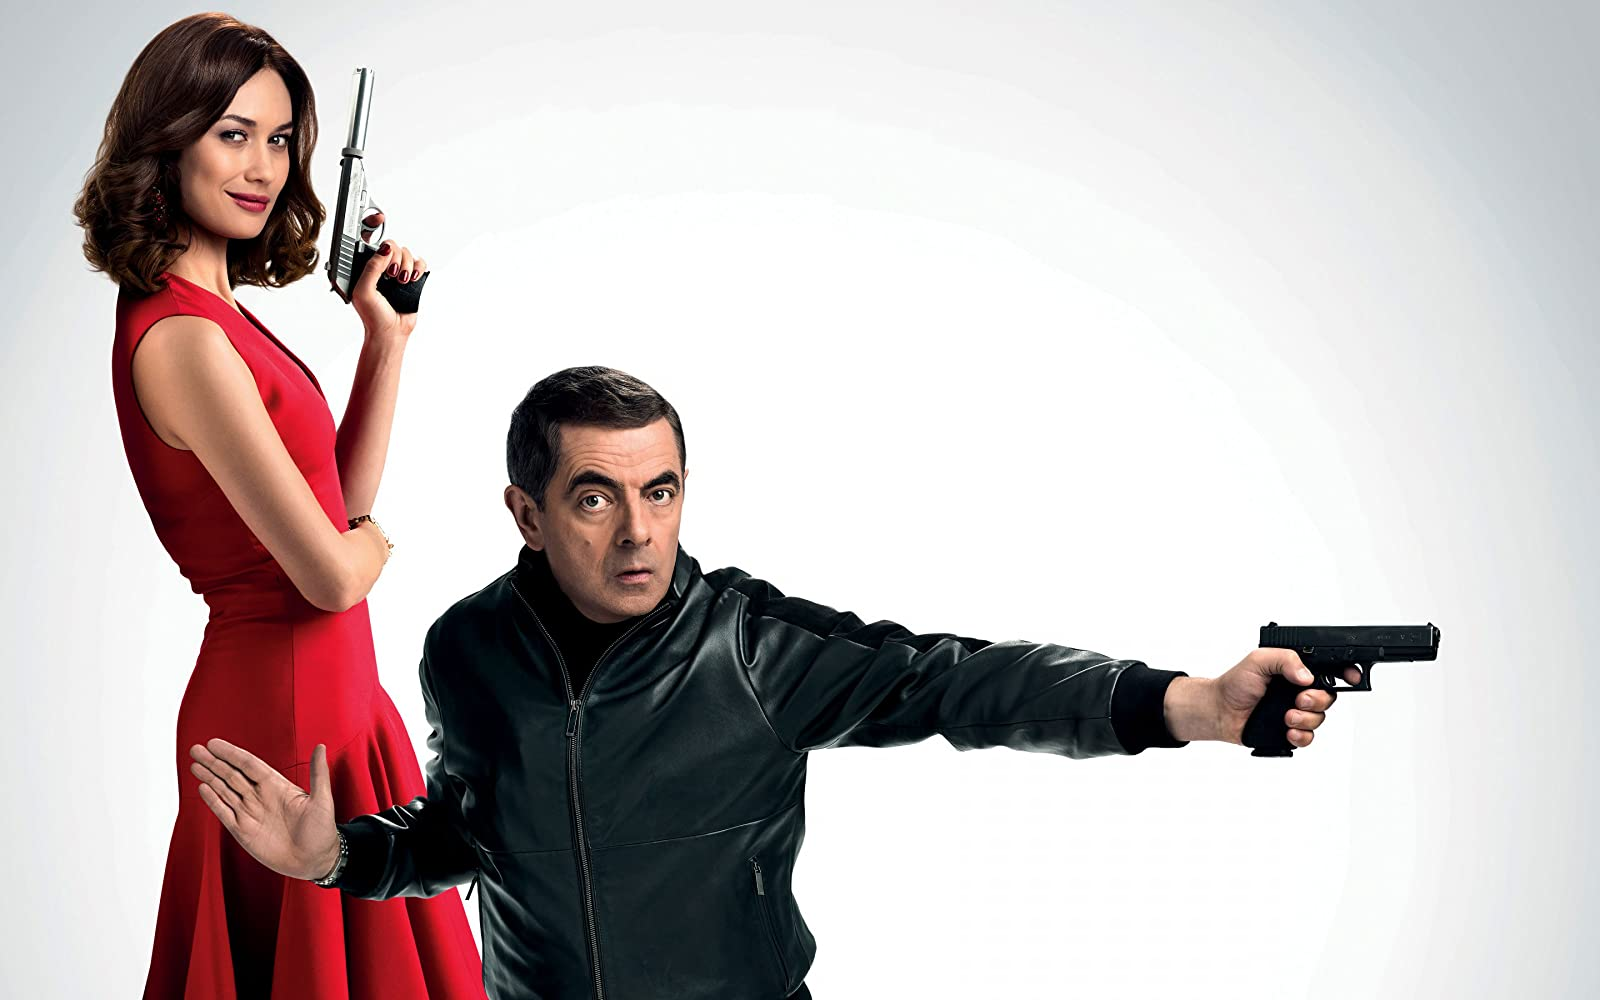 Rowan Atkinson and Olga Kurylenko in Johnny English Strikes Again (2018)